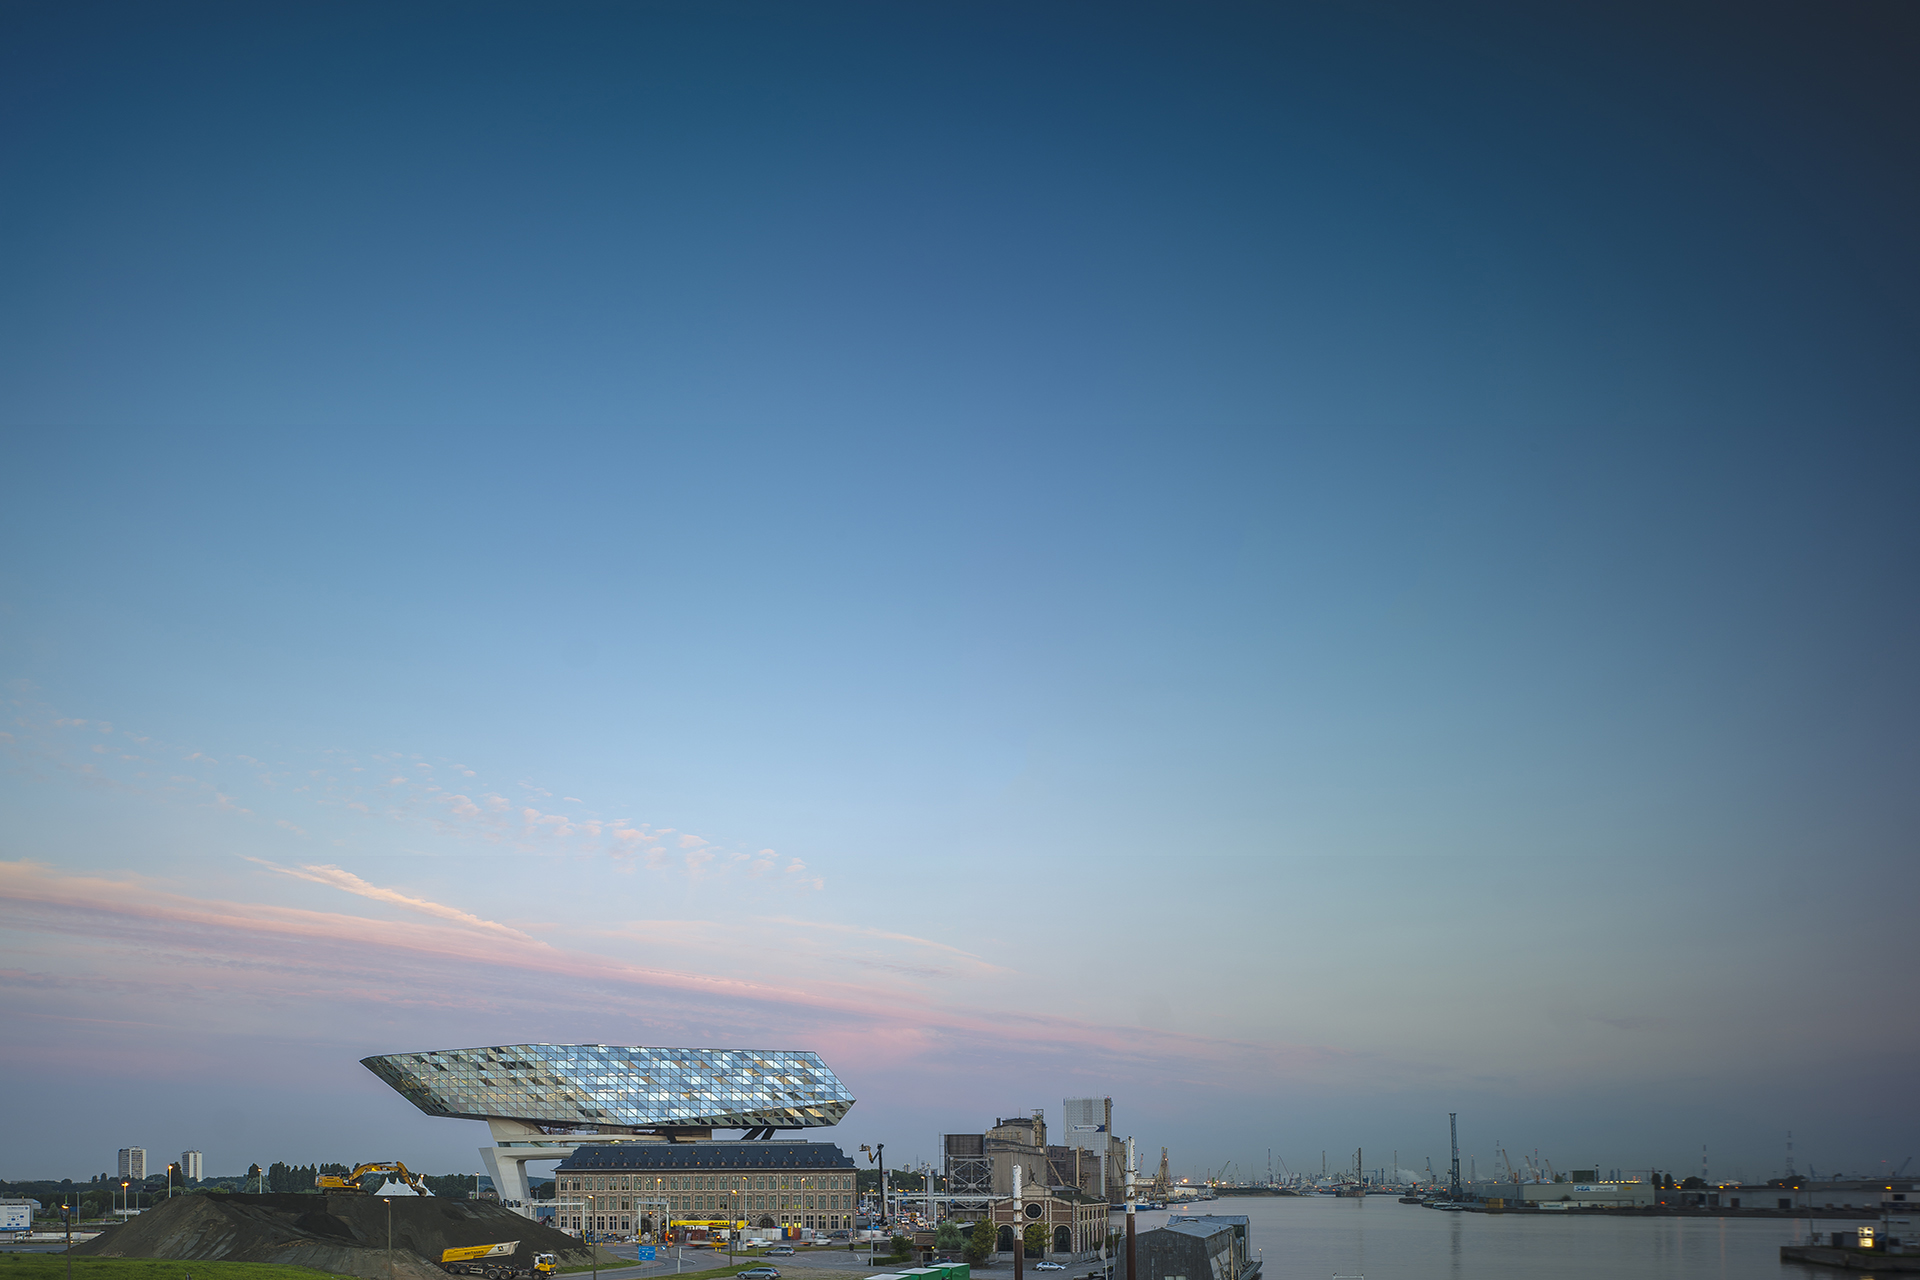 Antwerp Port House At Dawn - Zaha Hadid Architects